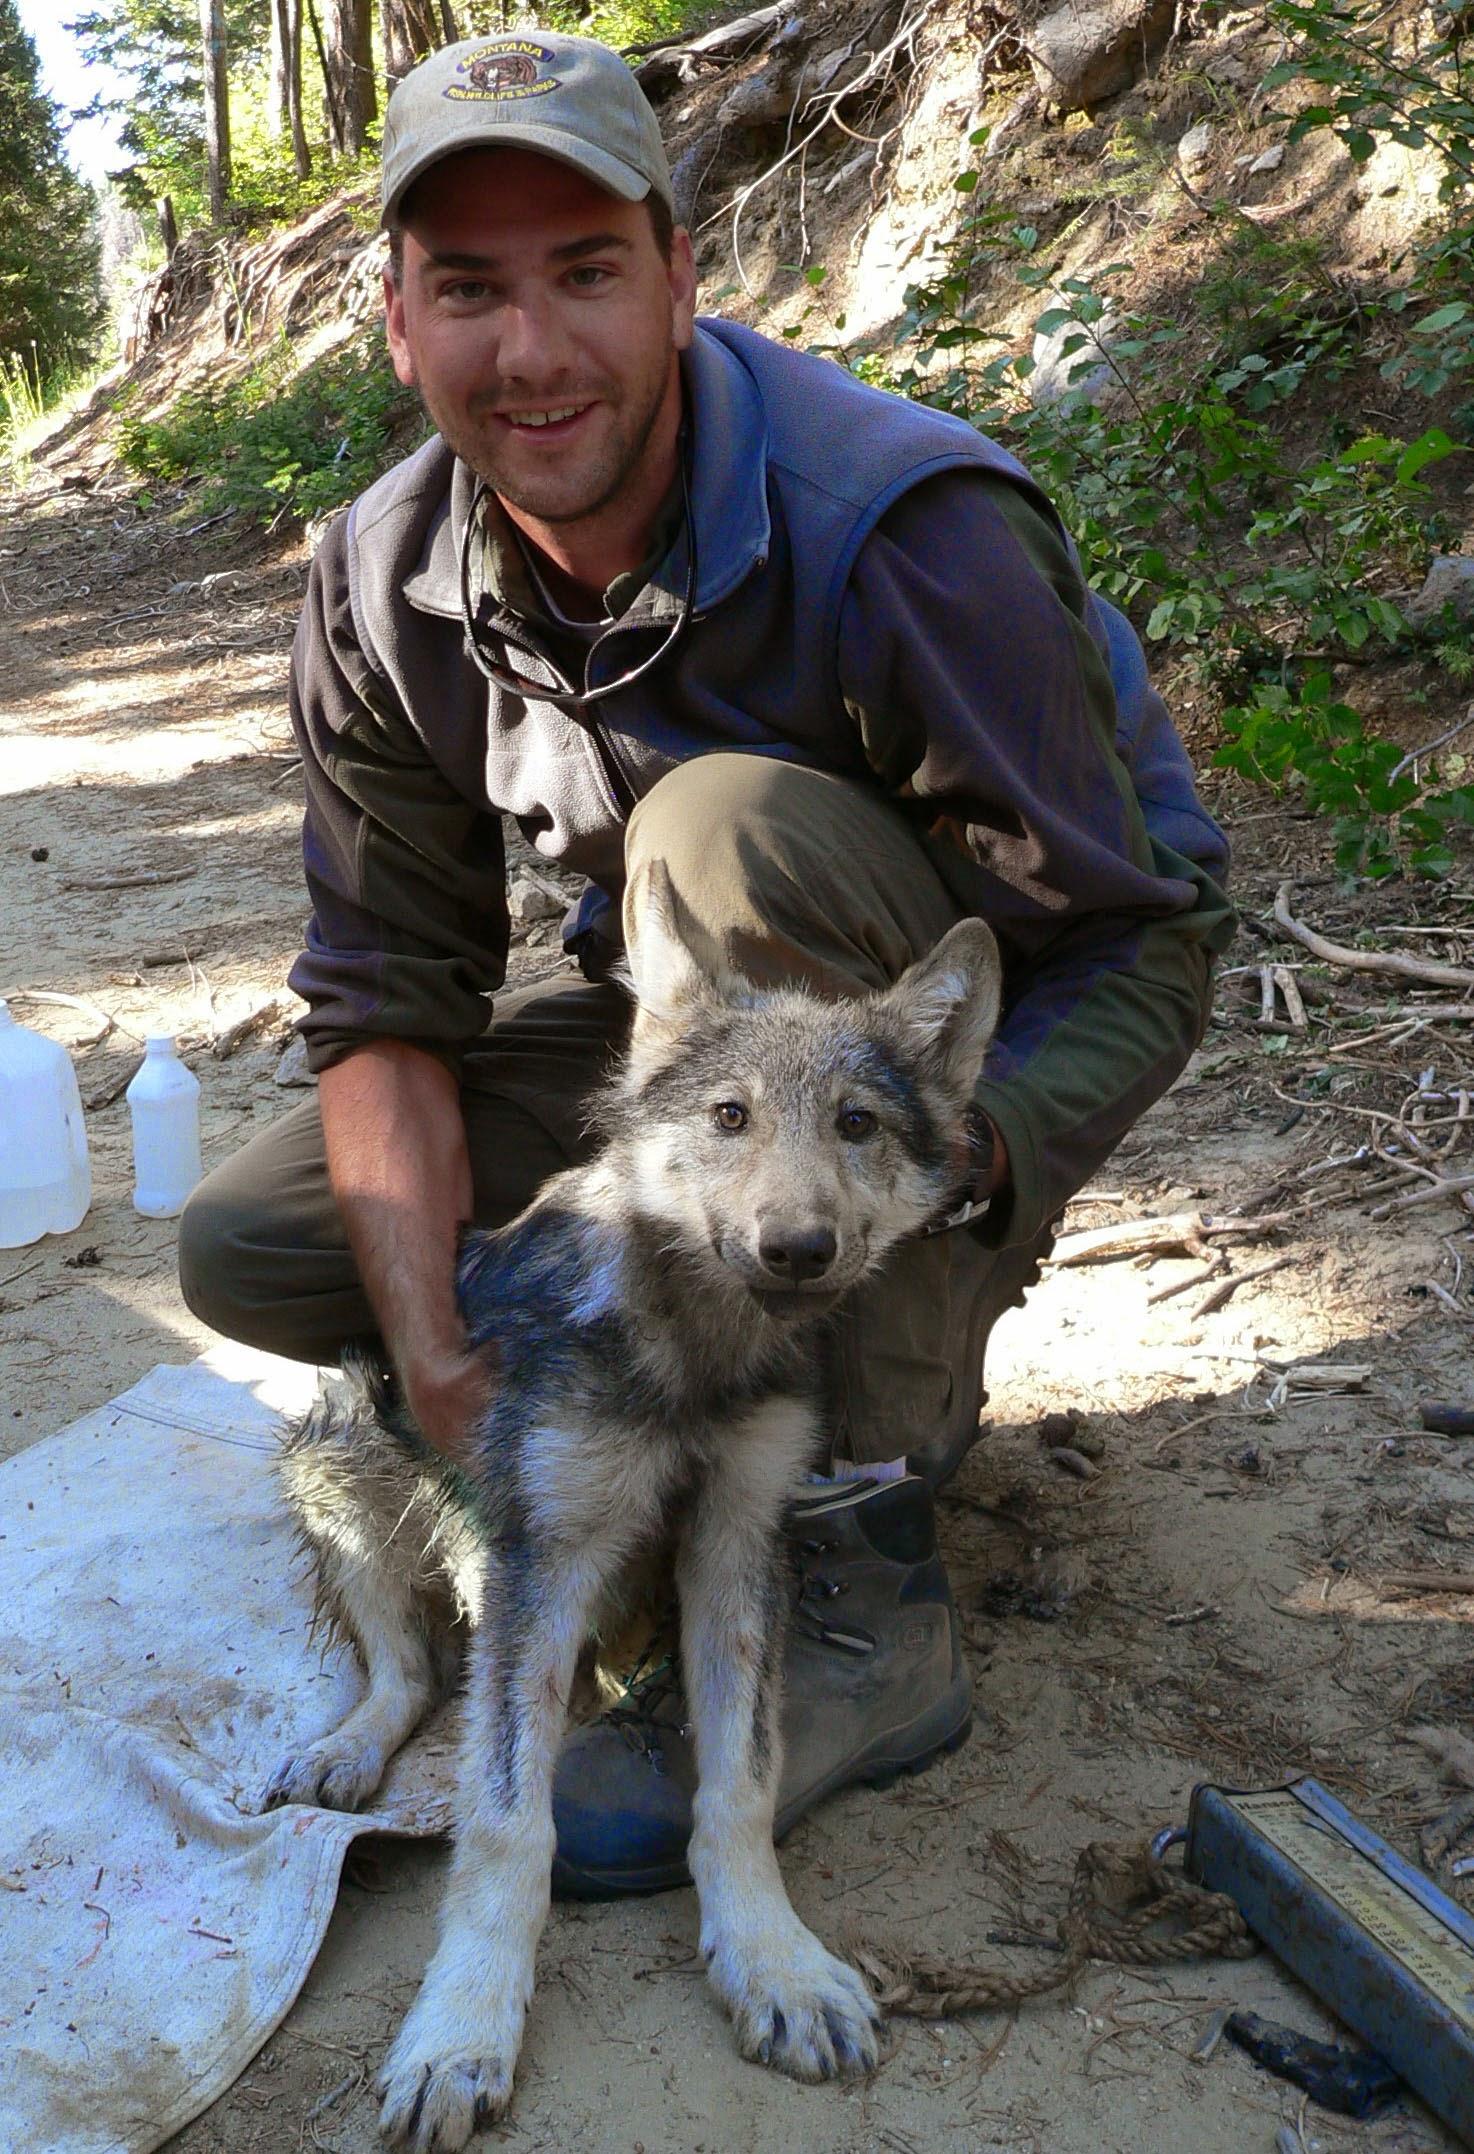 TyandwolfpupfemaleEFB_edited-1.jpg